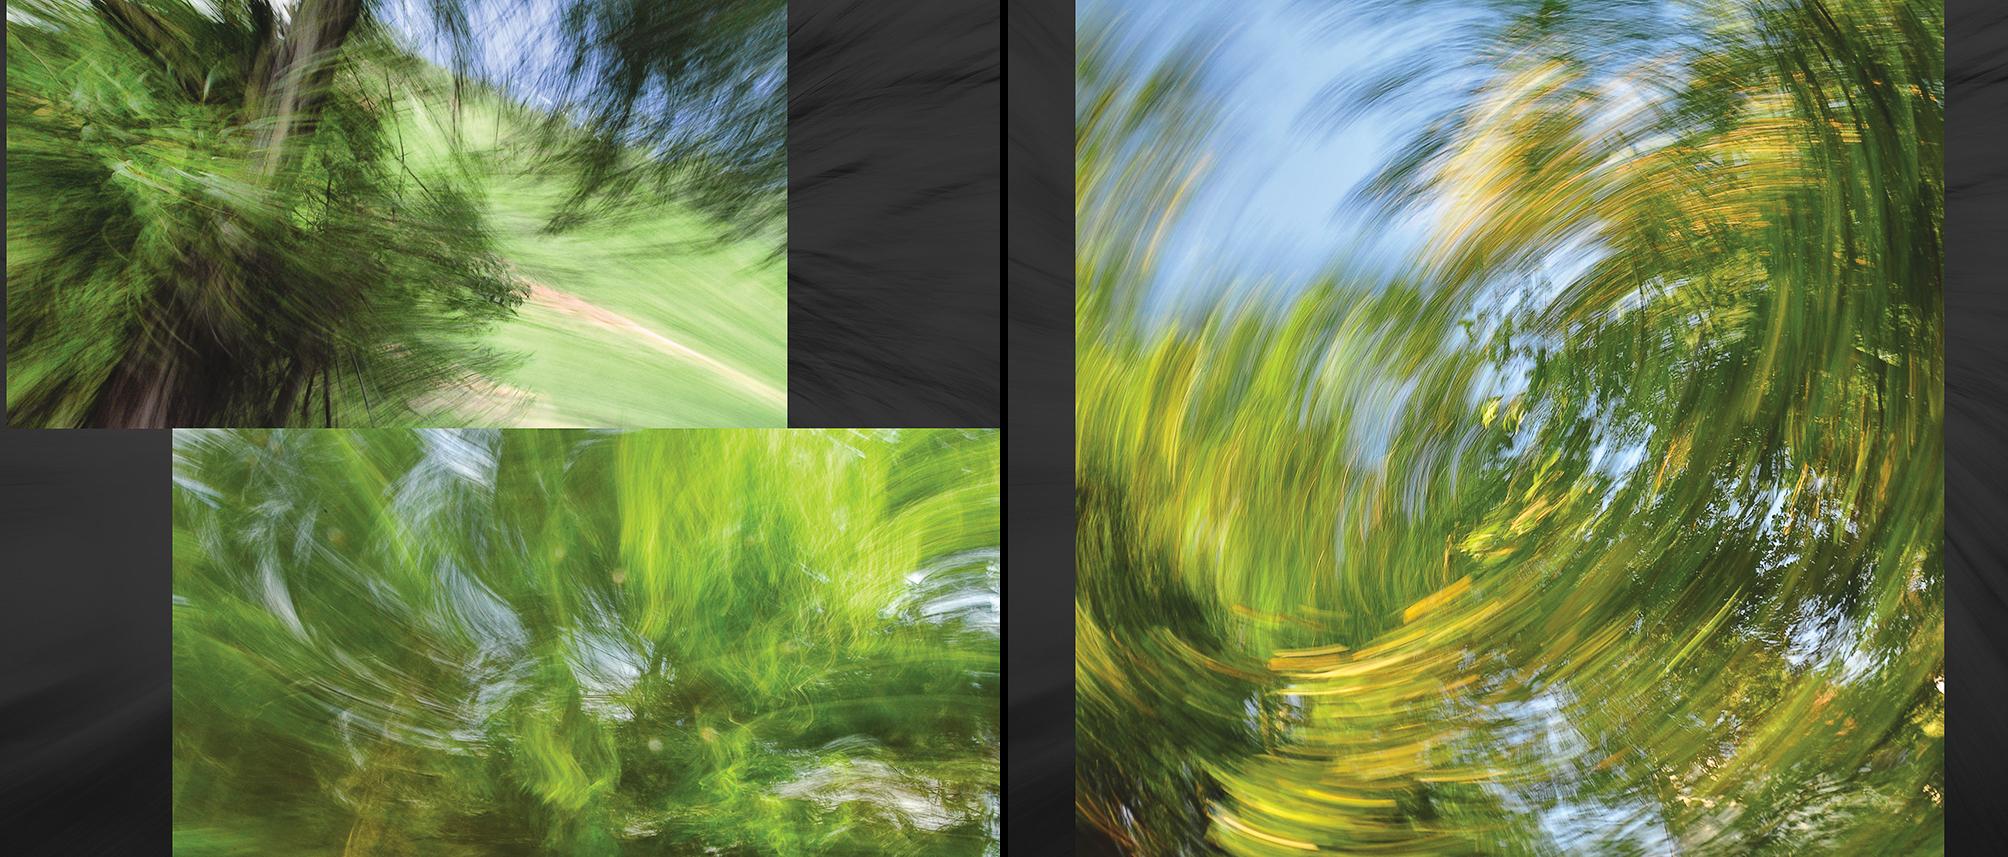 Carlin - Tree Whispers v2012_Page_13-14.jpg